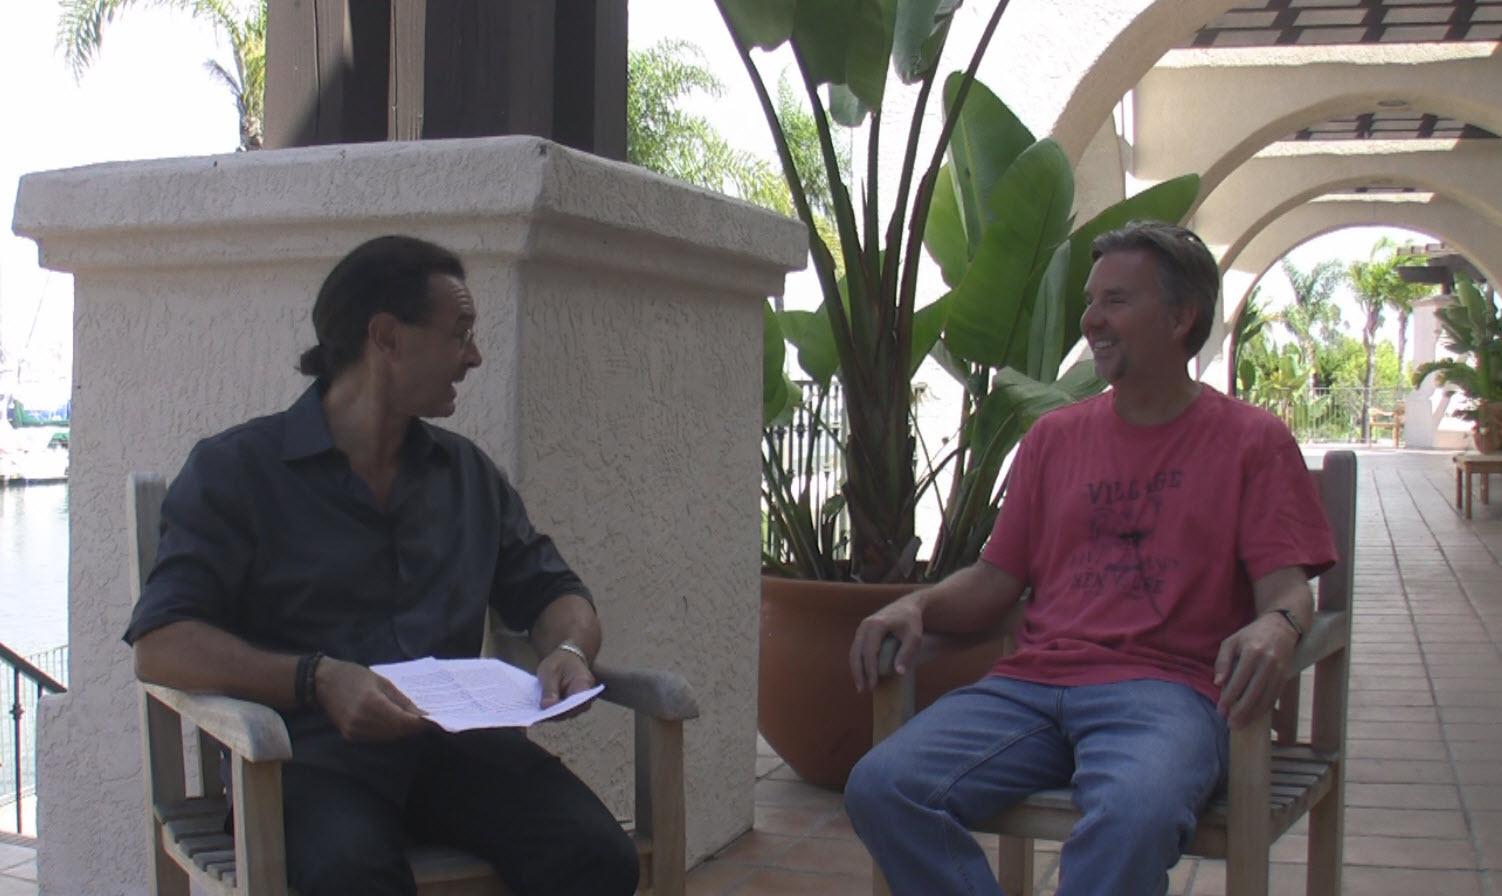 Dr. Alex Loyd and Jorge Patrono